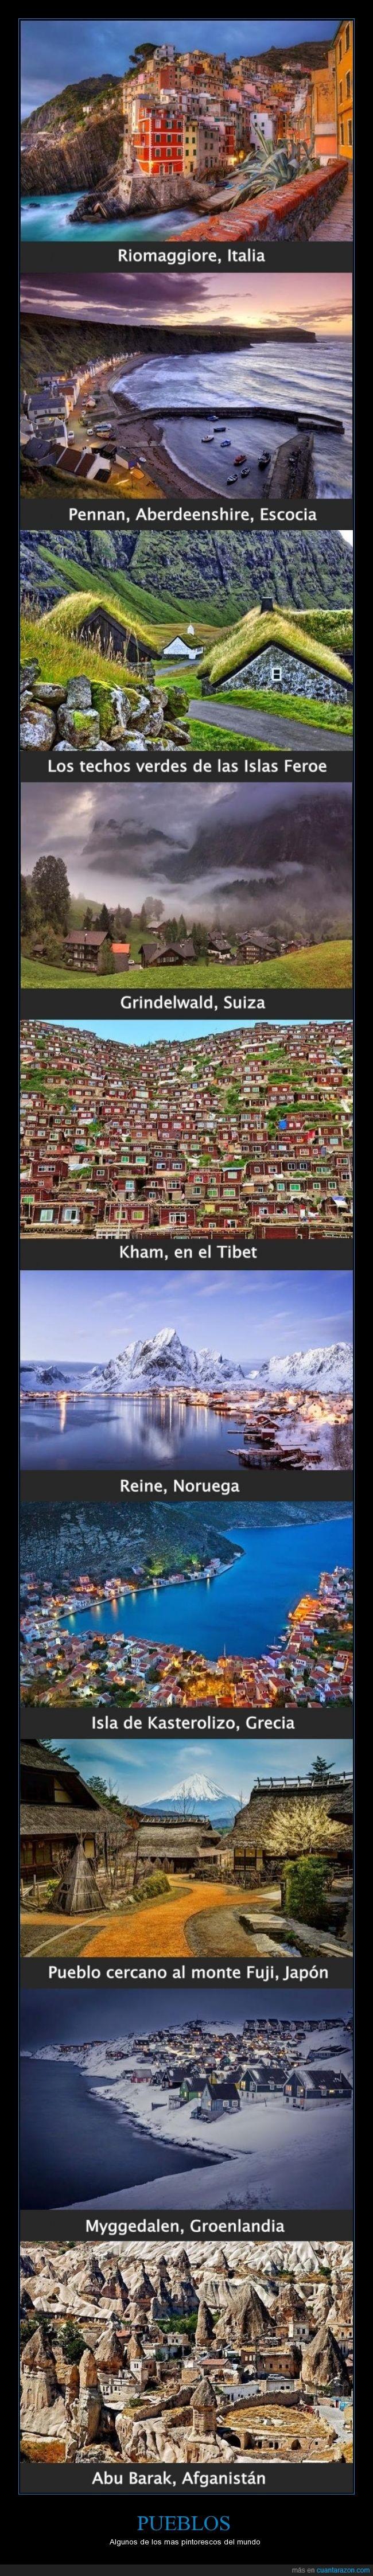 Abu Barak,Afganistán,Fuji,Grecia,Groenlandia,Japón,Kasterolizo,Myggedalen,Noruega,pintorescos,Reine,Tibet